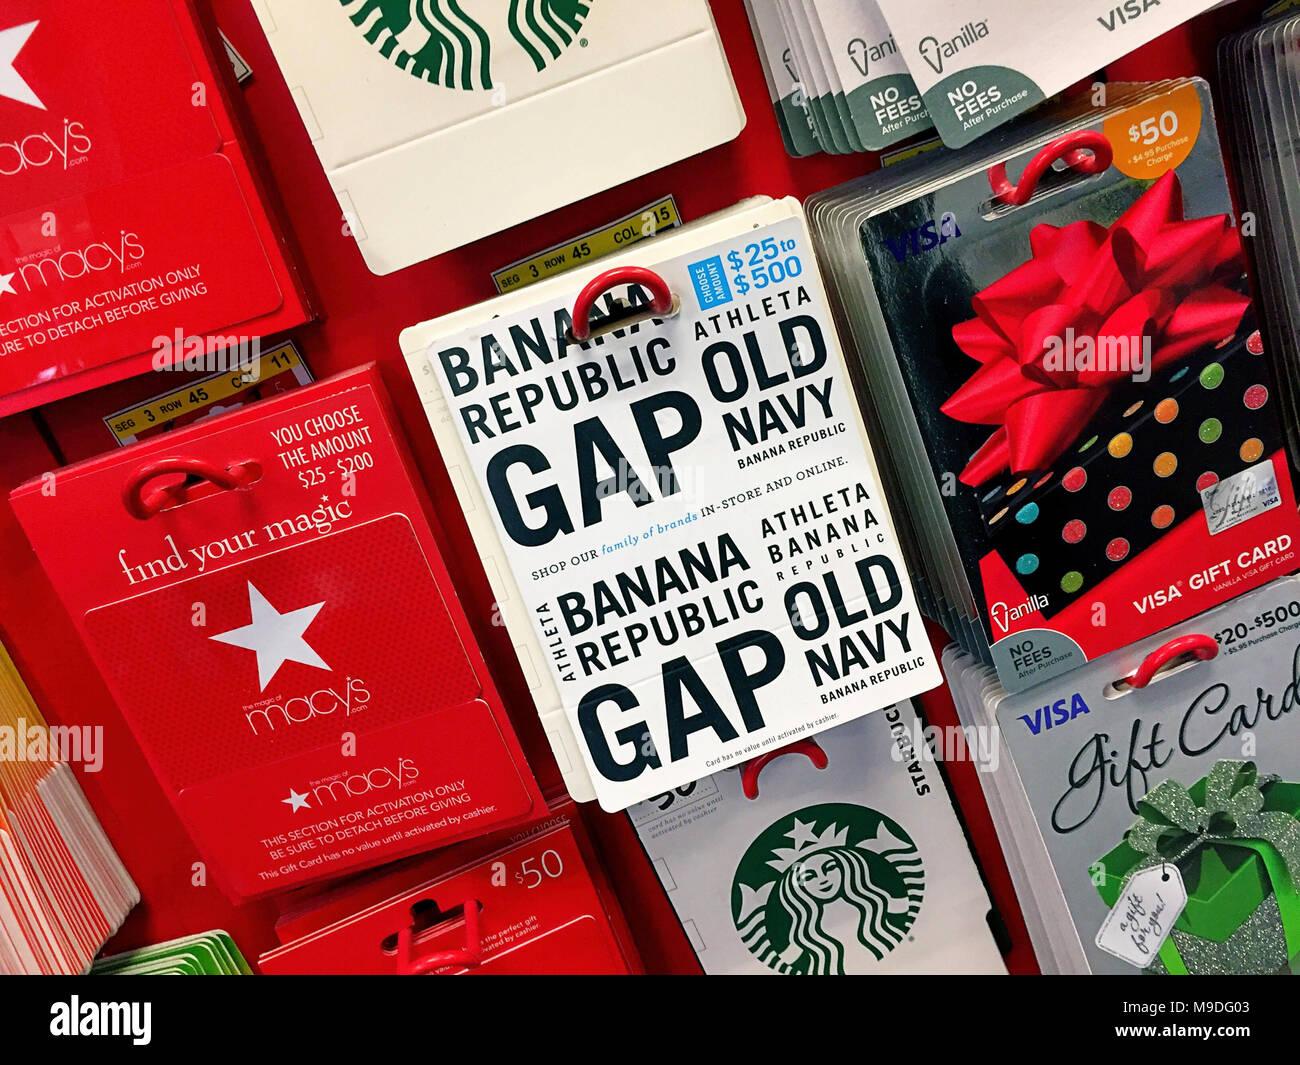 prepaid gift cards display usa stock image - Prepaid Card Usa